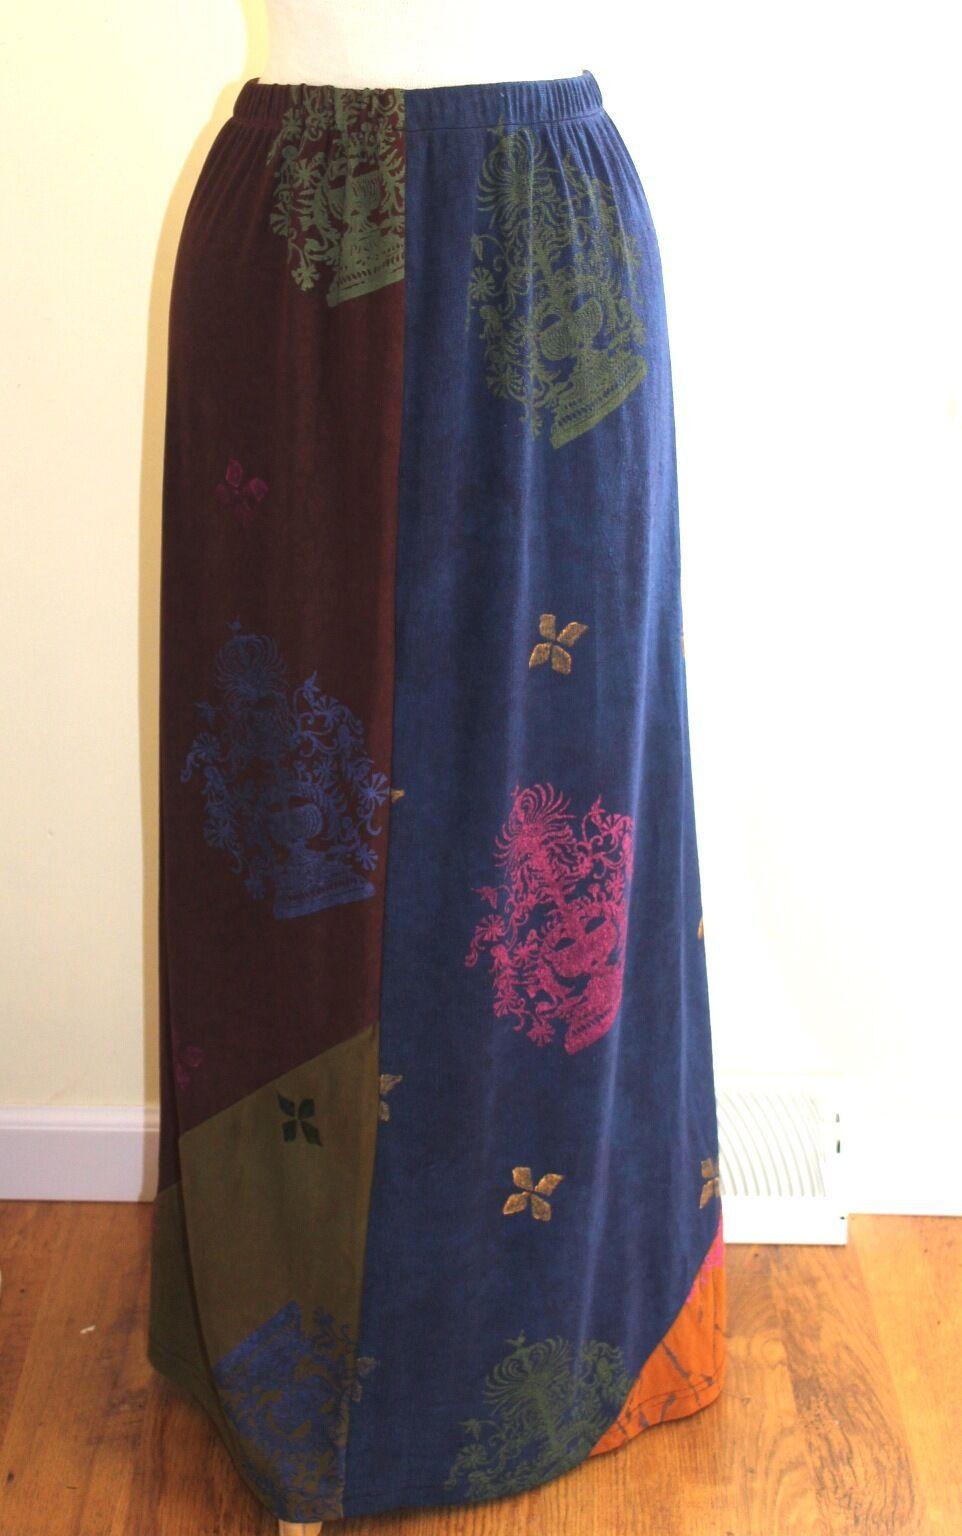 JG'S Mad Lab Staley Gretzinger bluee Brown Green Art Hand Painted Knit Skirt Sz L